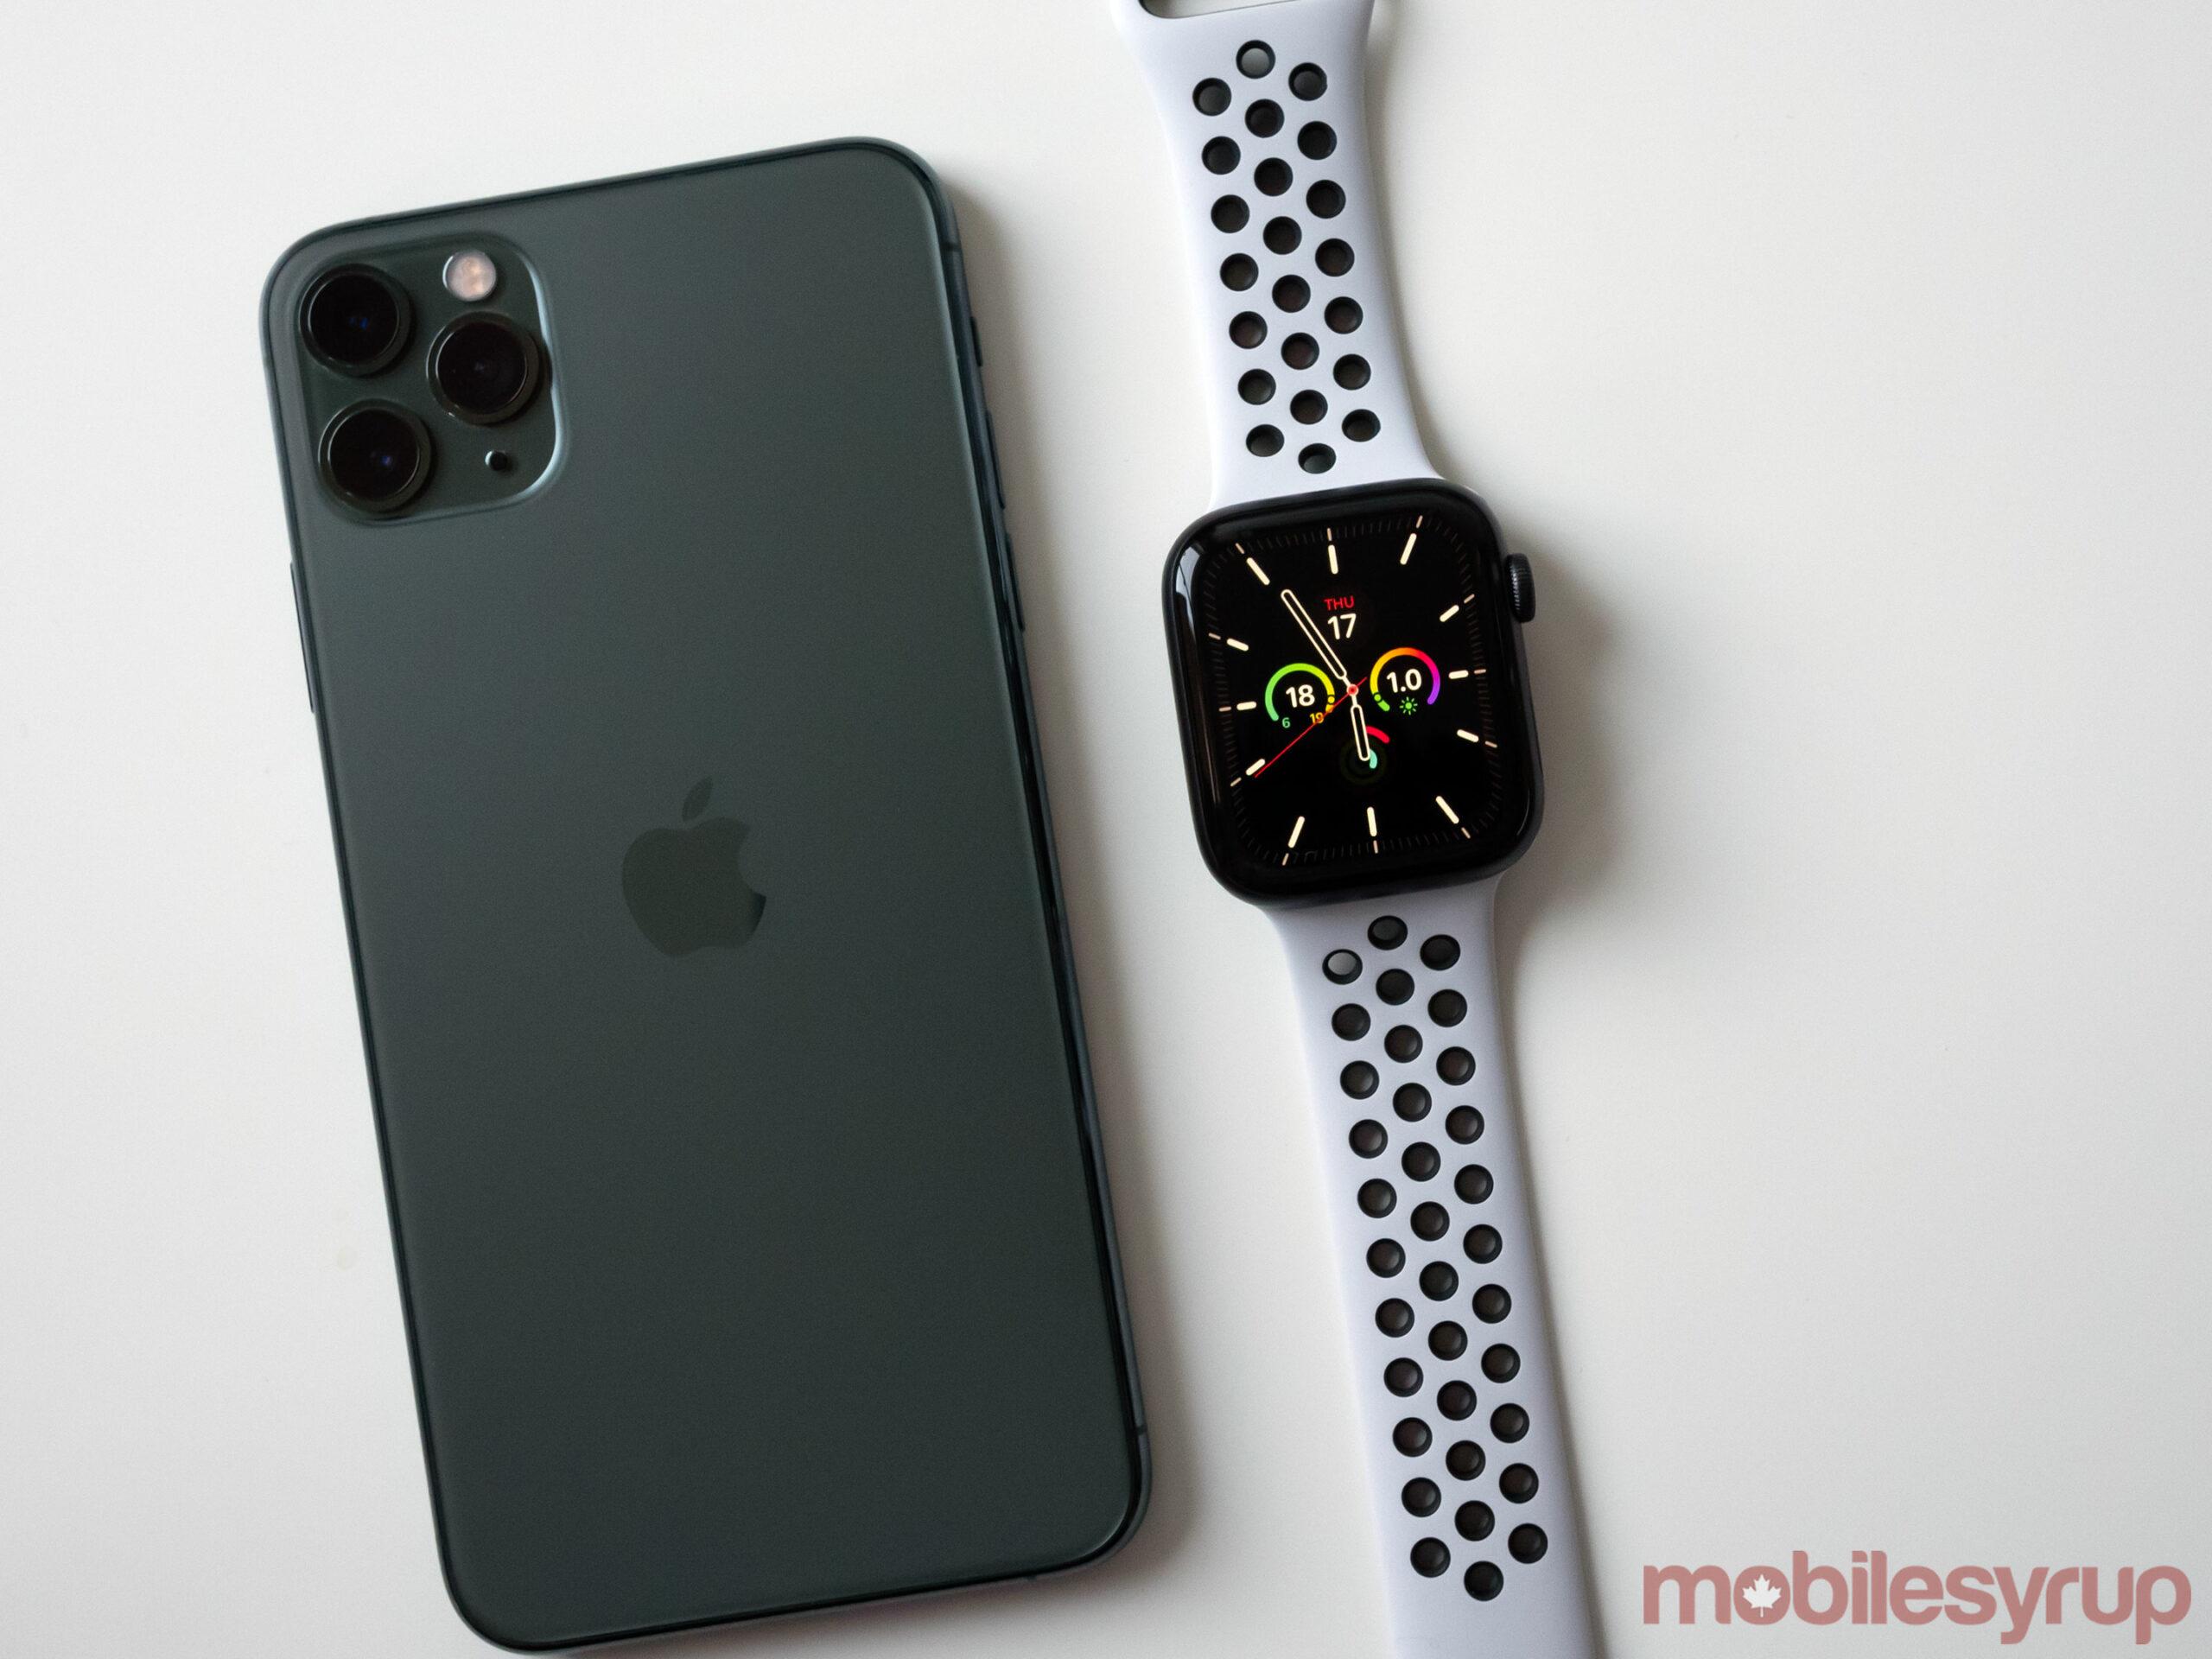 Apple Watch SE beside iPhone 11 Pro Max